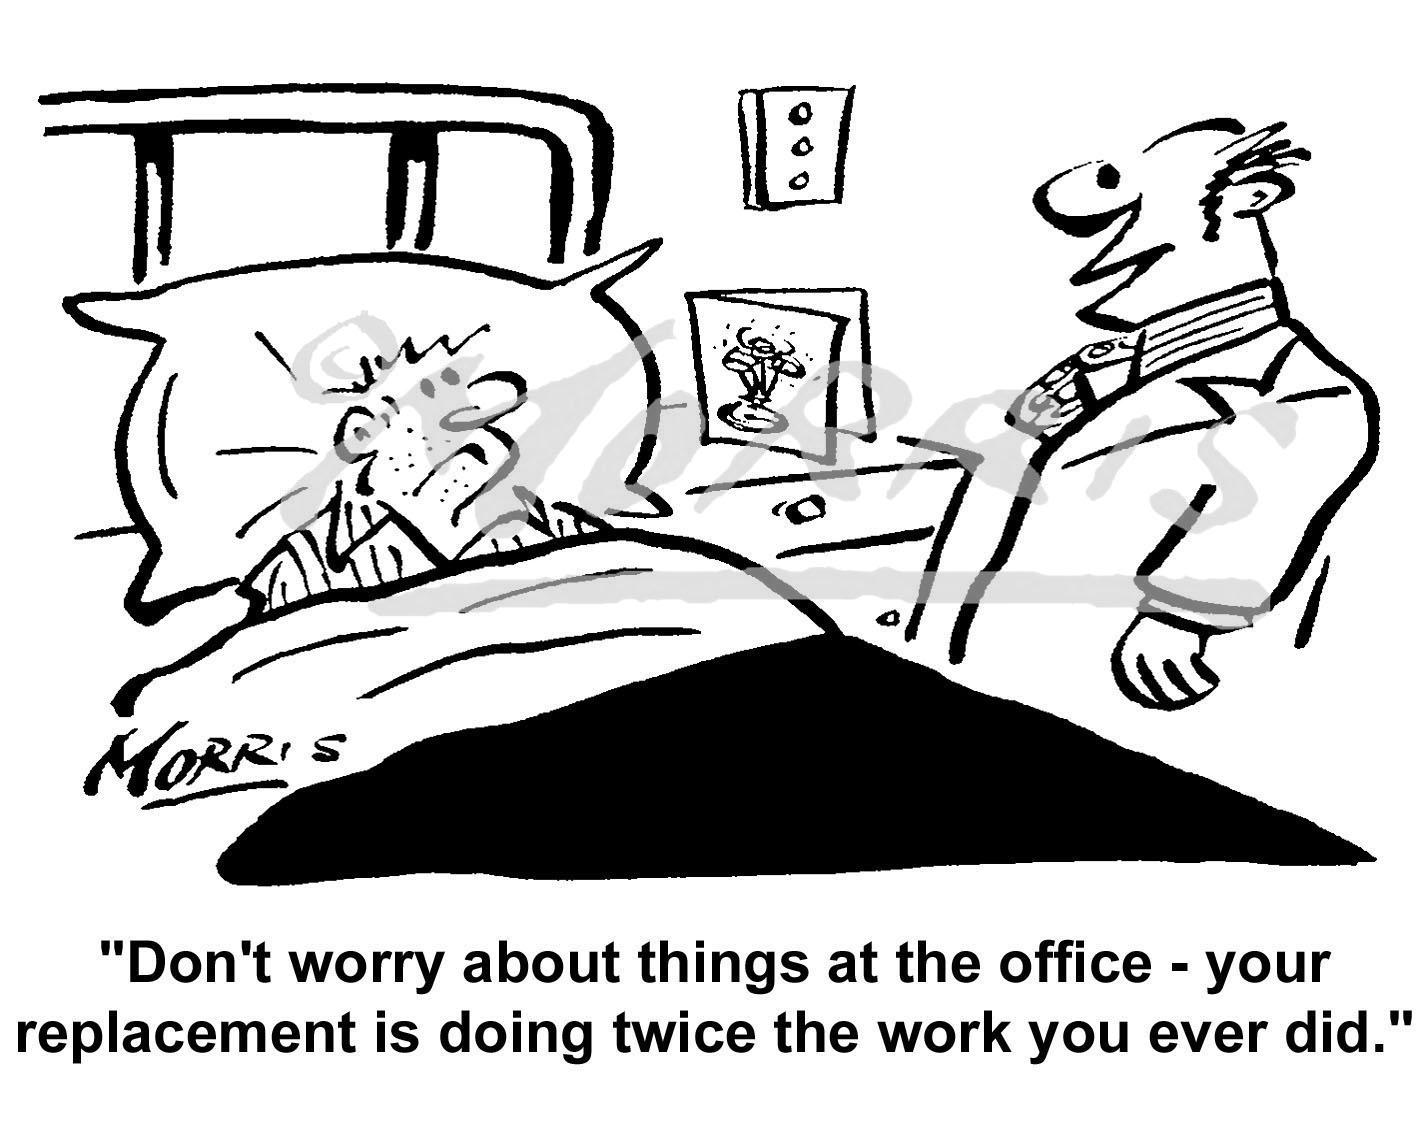 Office worker/staff workload cartoon